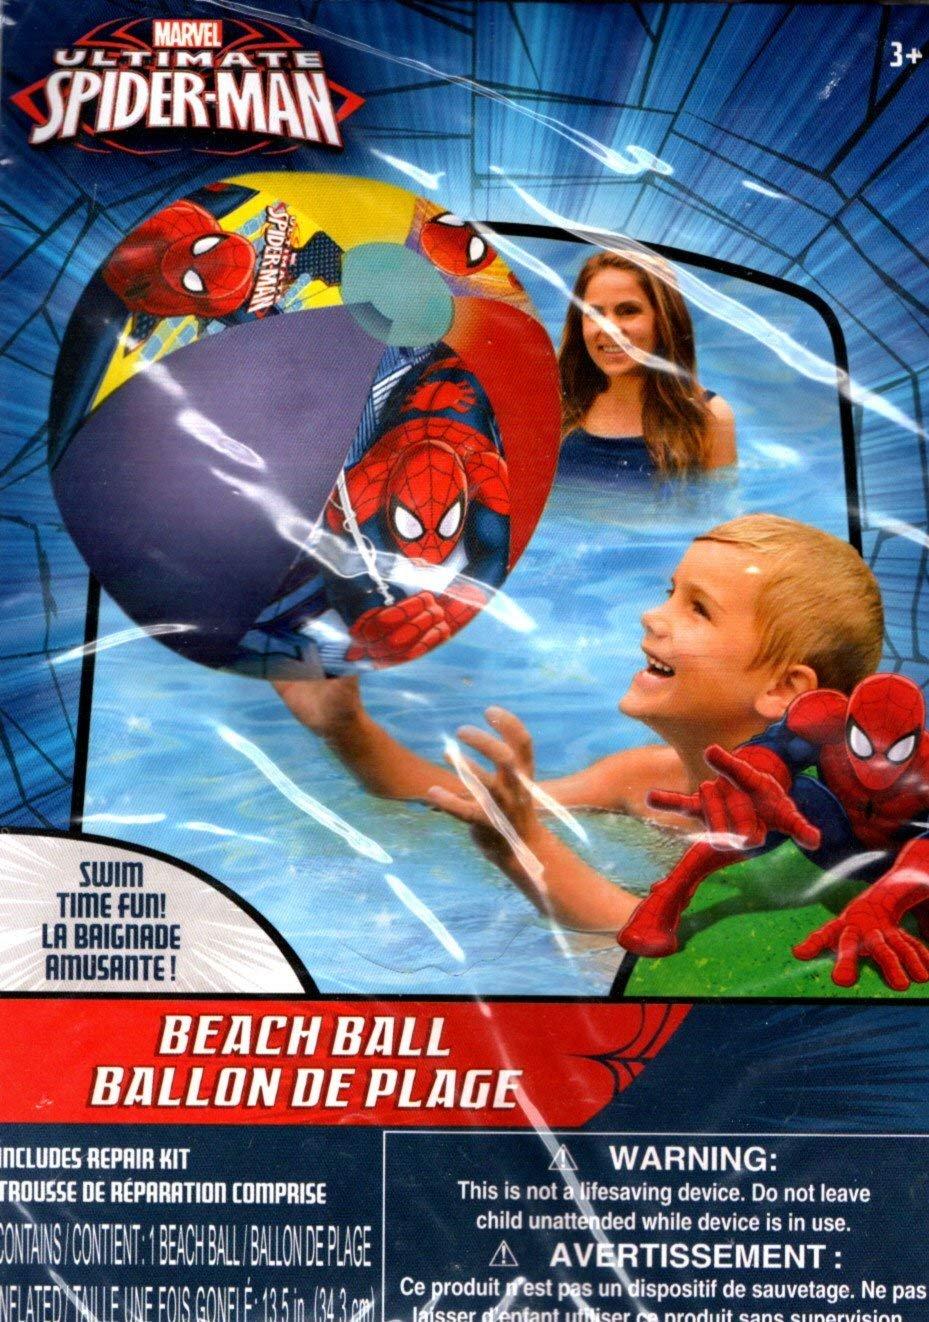 Marvel Spider-Man - Beach Ball - Includes Repair Kit - Swim Time Fun!